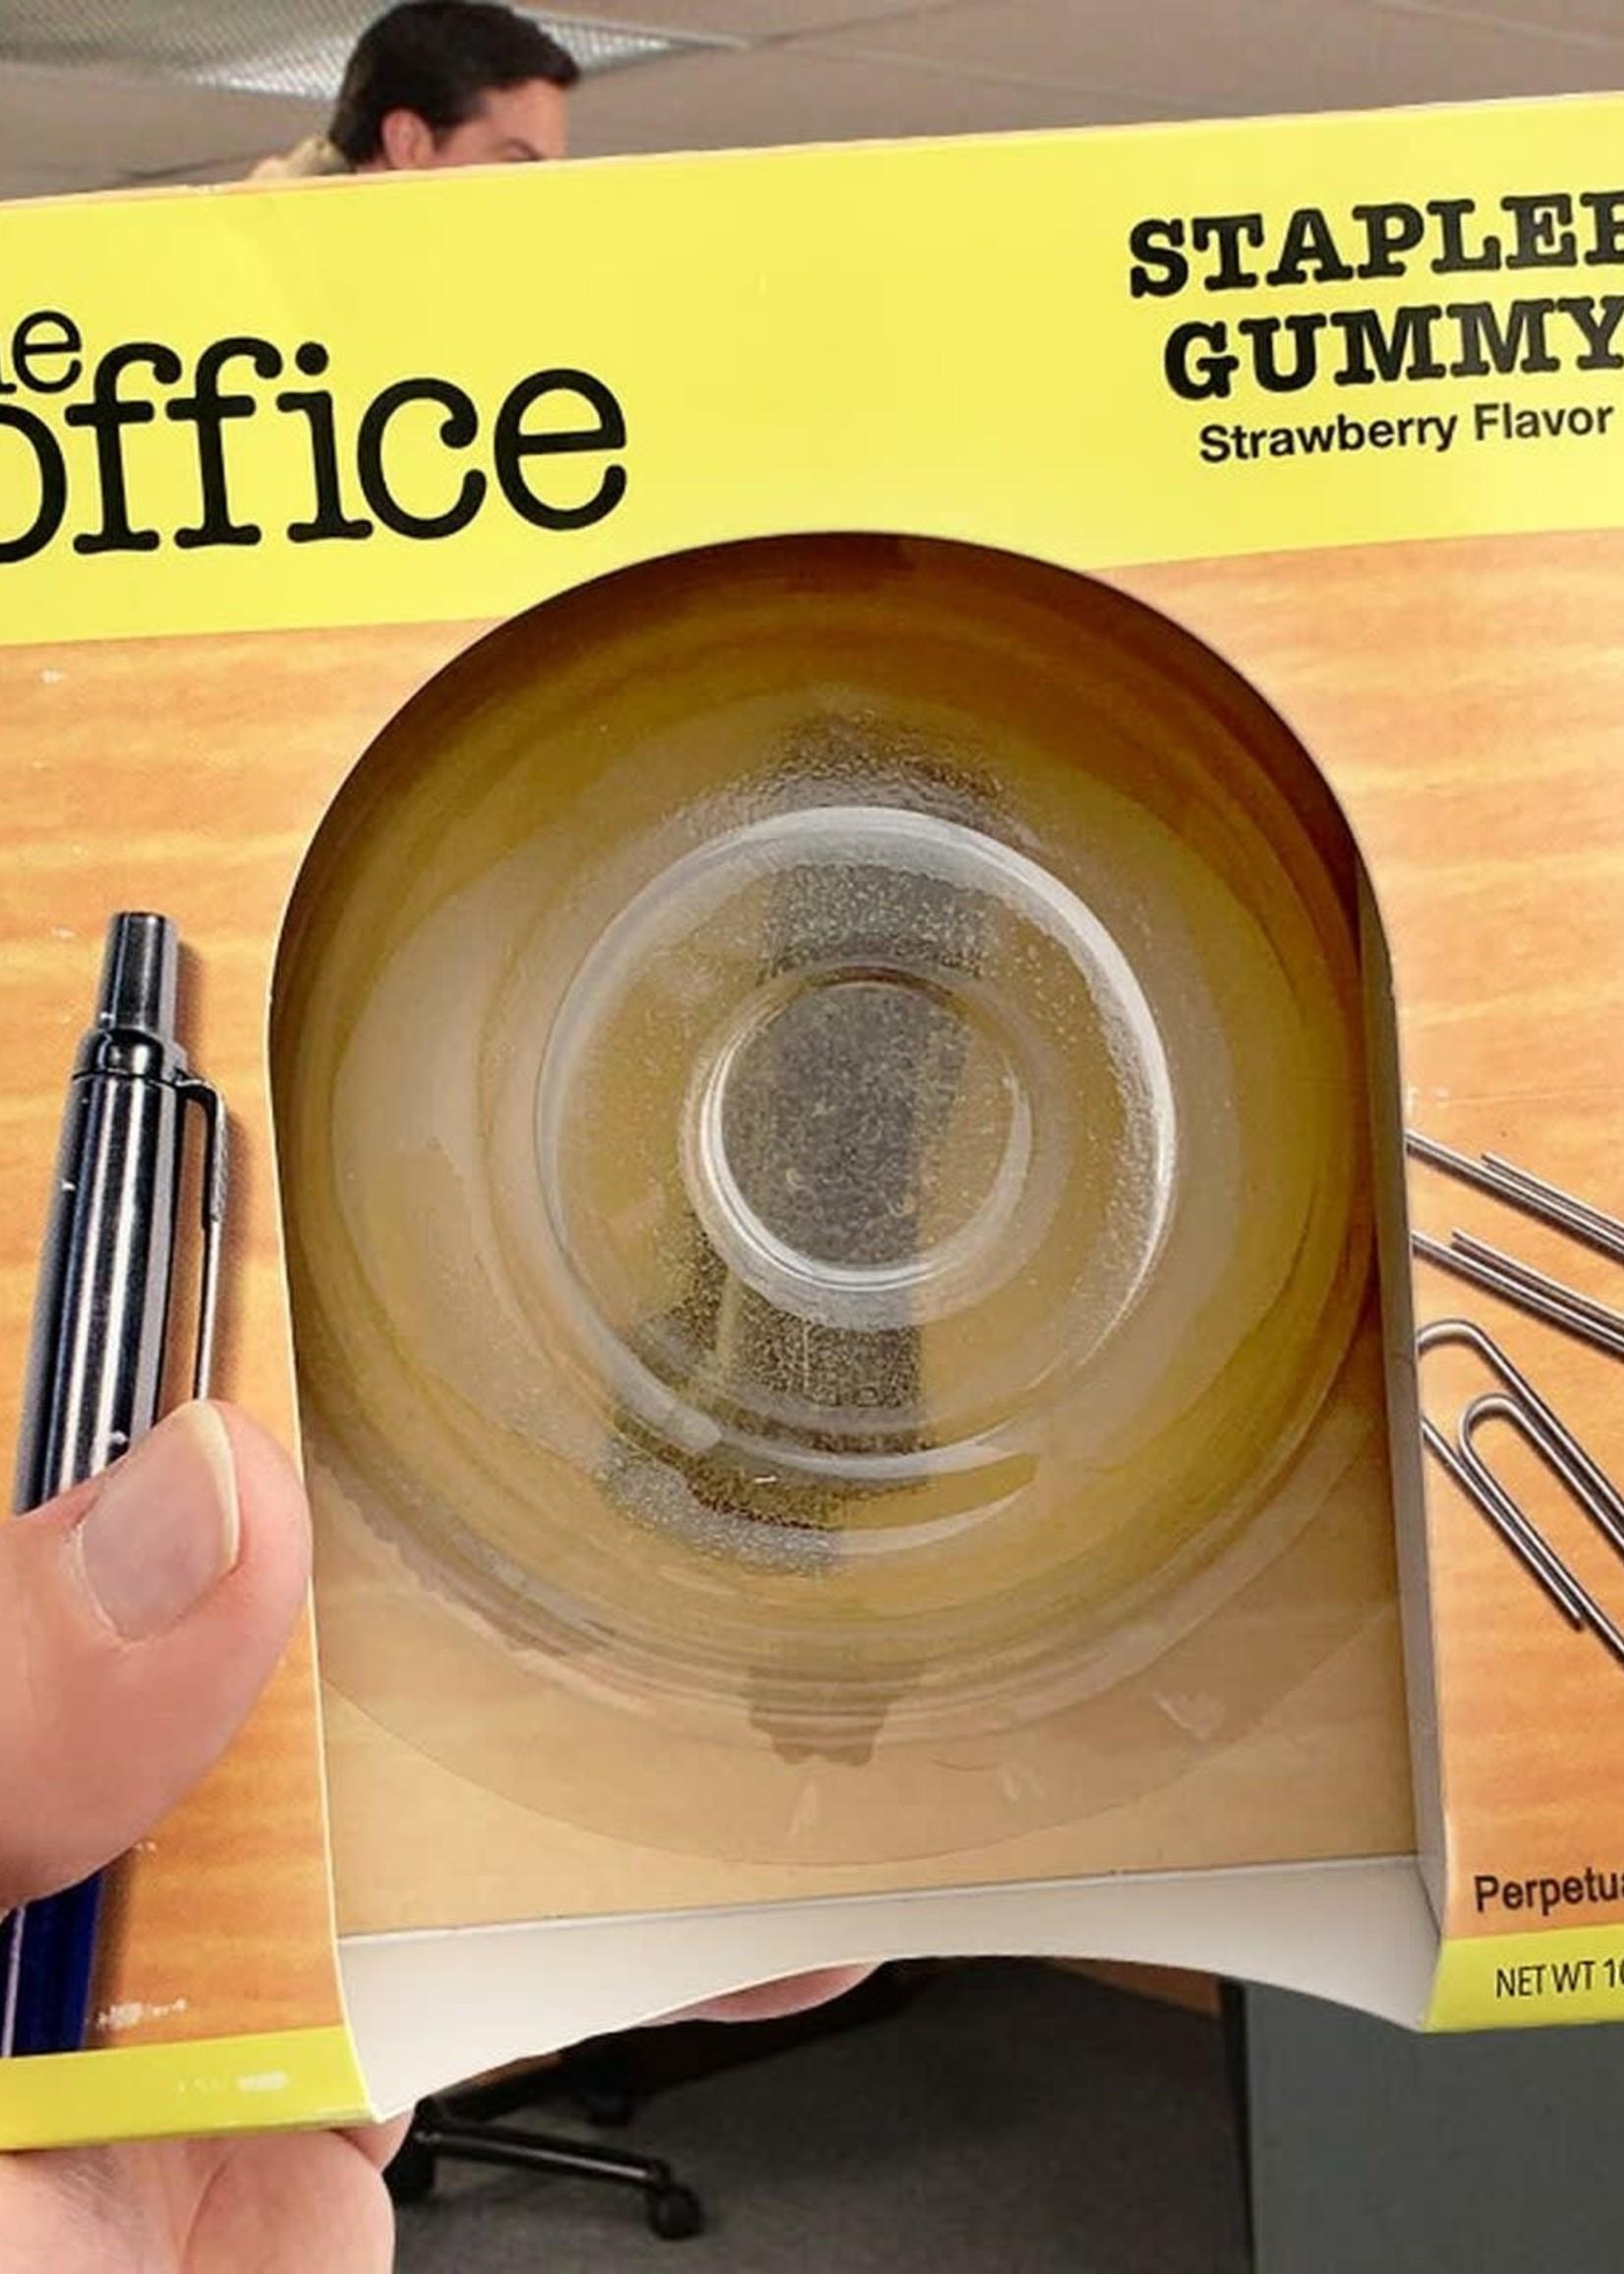 GRANDPA JOE'S CANDY SHOP THE OFFICE JELLO STAPLER GUMMY